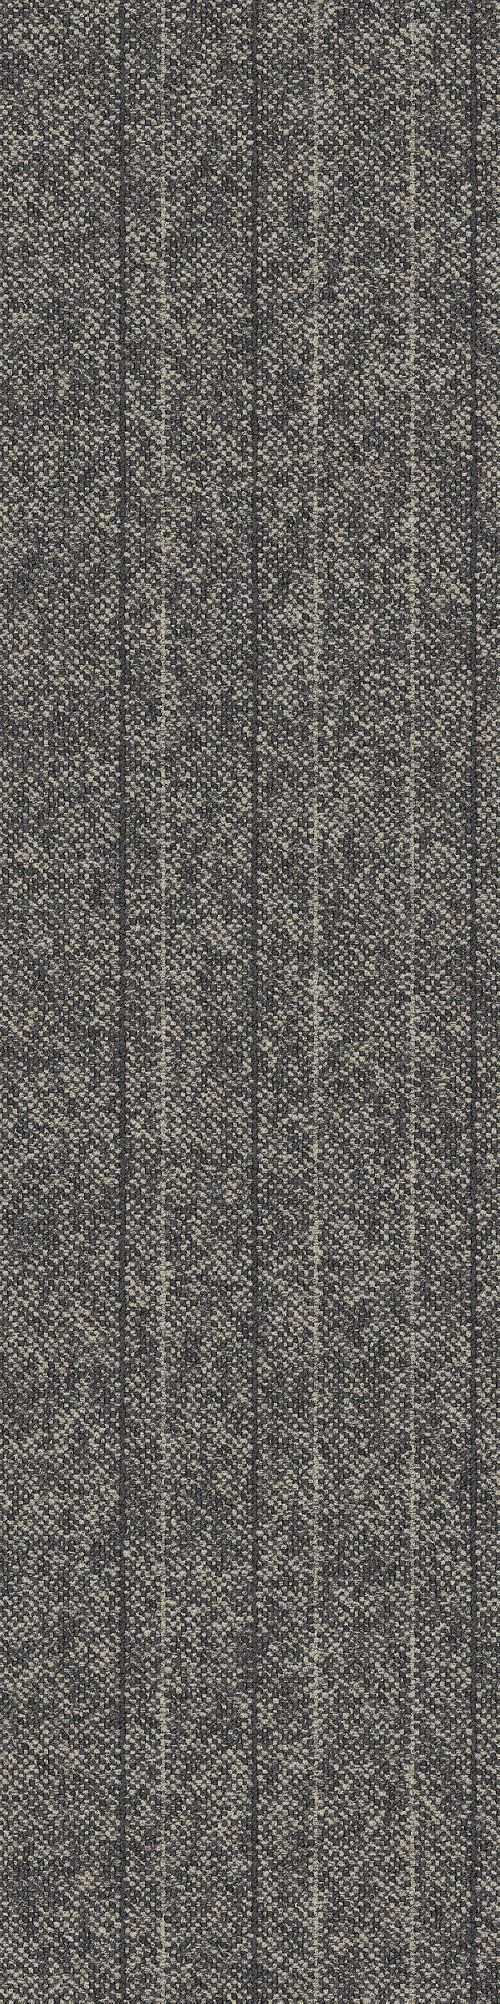 Interface carpet tile: WW860 Color name: Charcoal